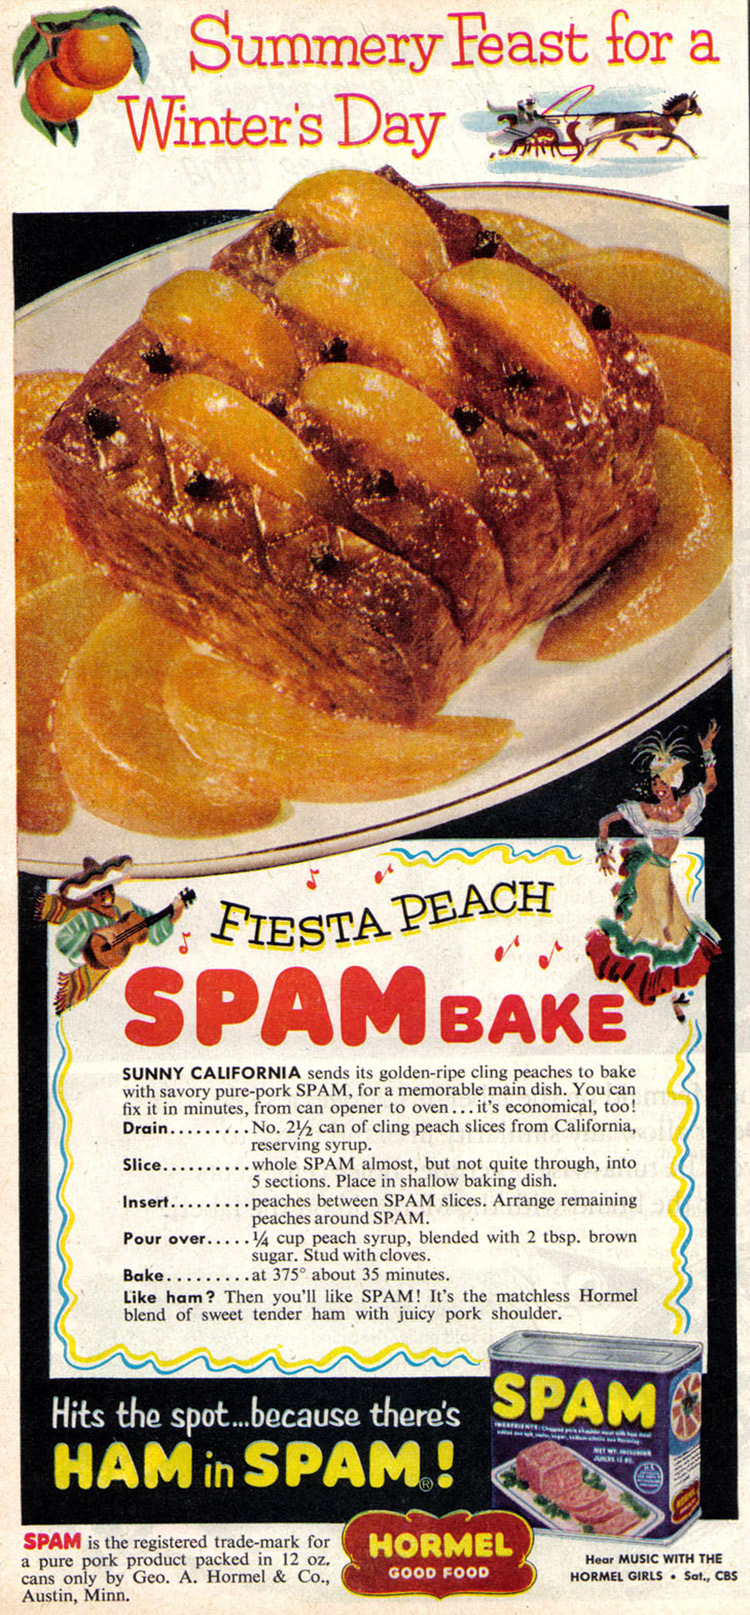 EC:  assets%2Fmessage-editor%2F1470142543709-fiesta-peach-spam-bake-inline-flickr